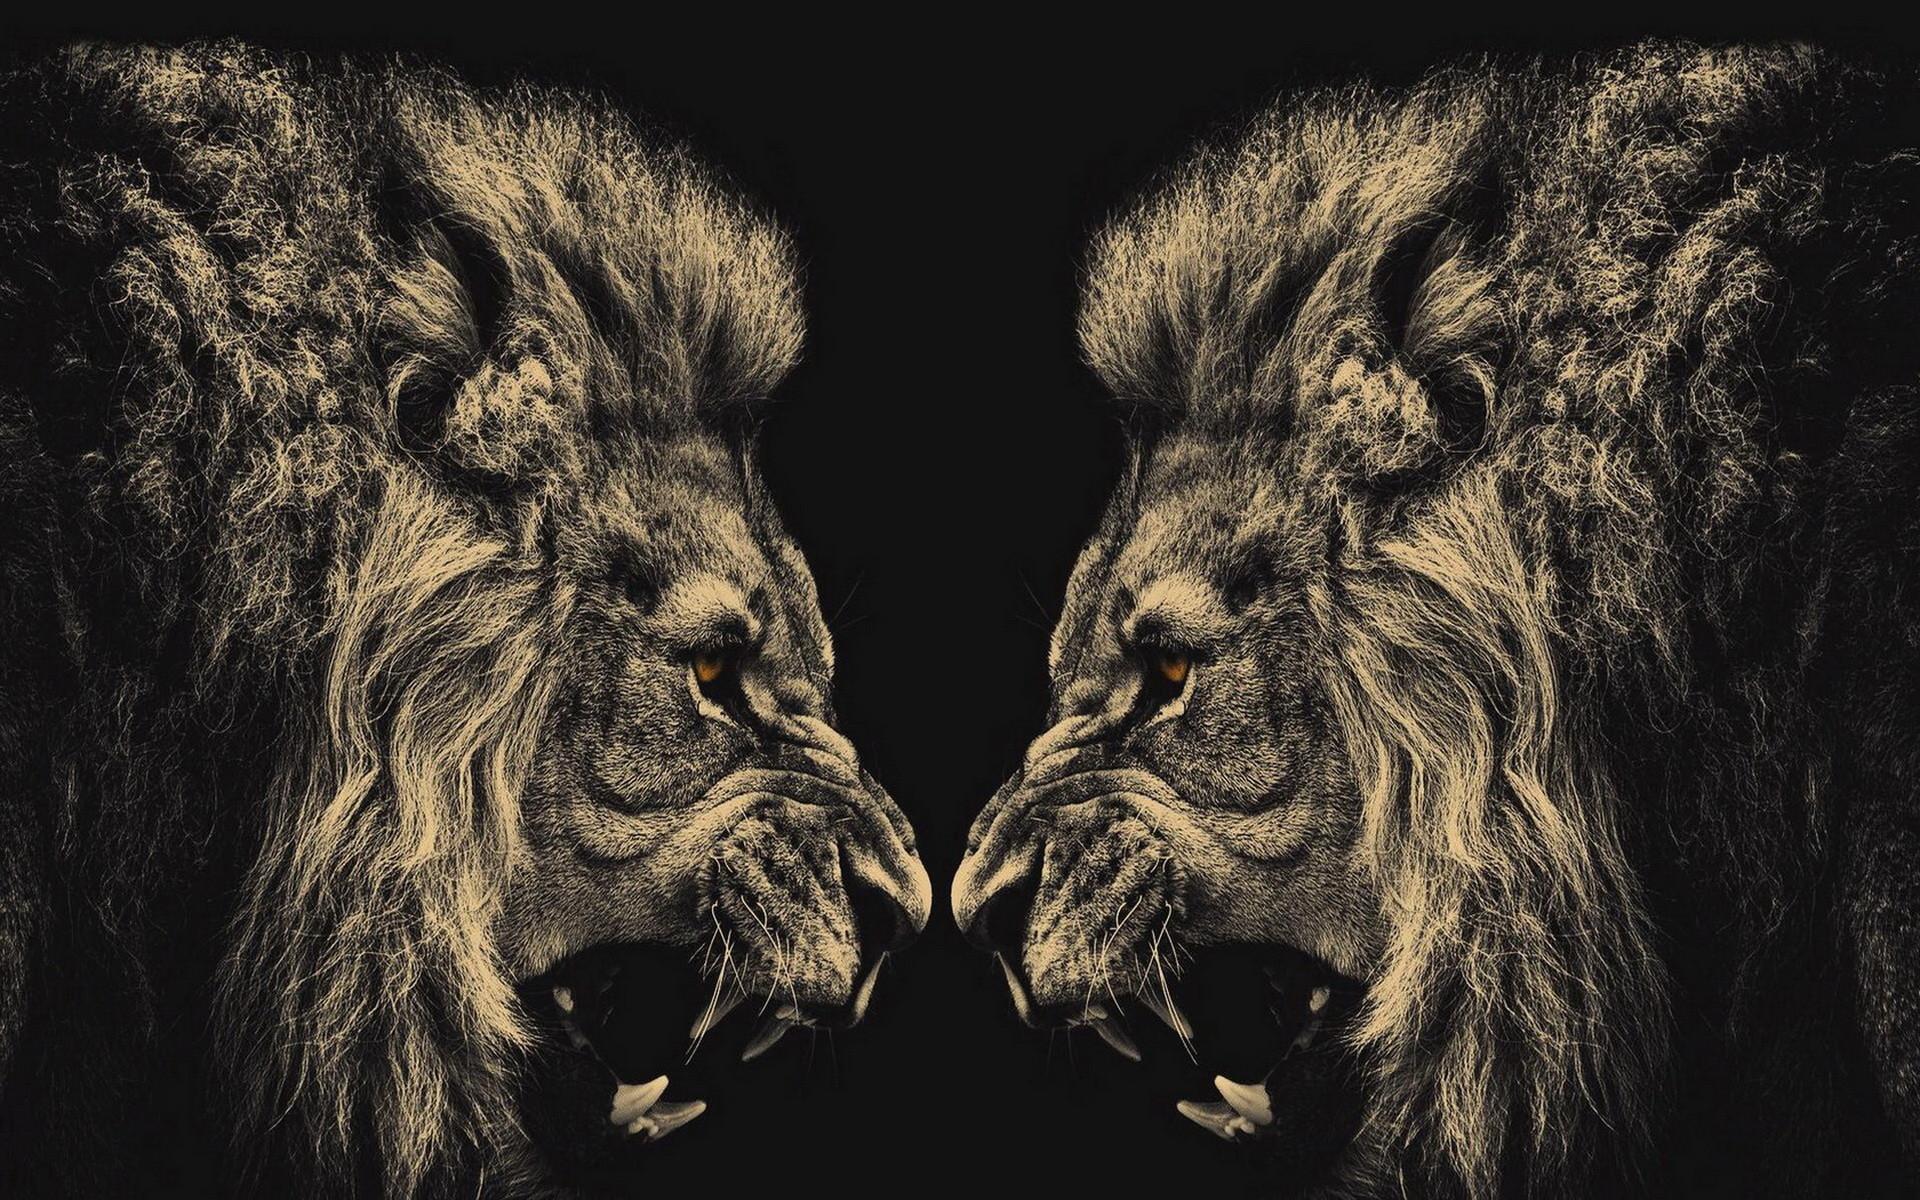 Lion Wallpaper Screensaver HD #10259 Wallpaper   Cool Walldiskpaper .